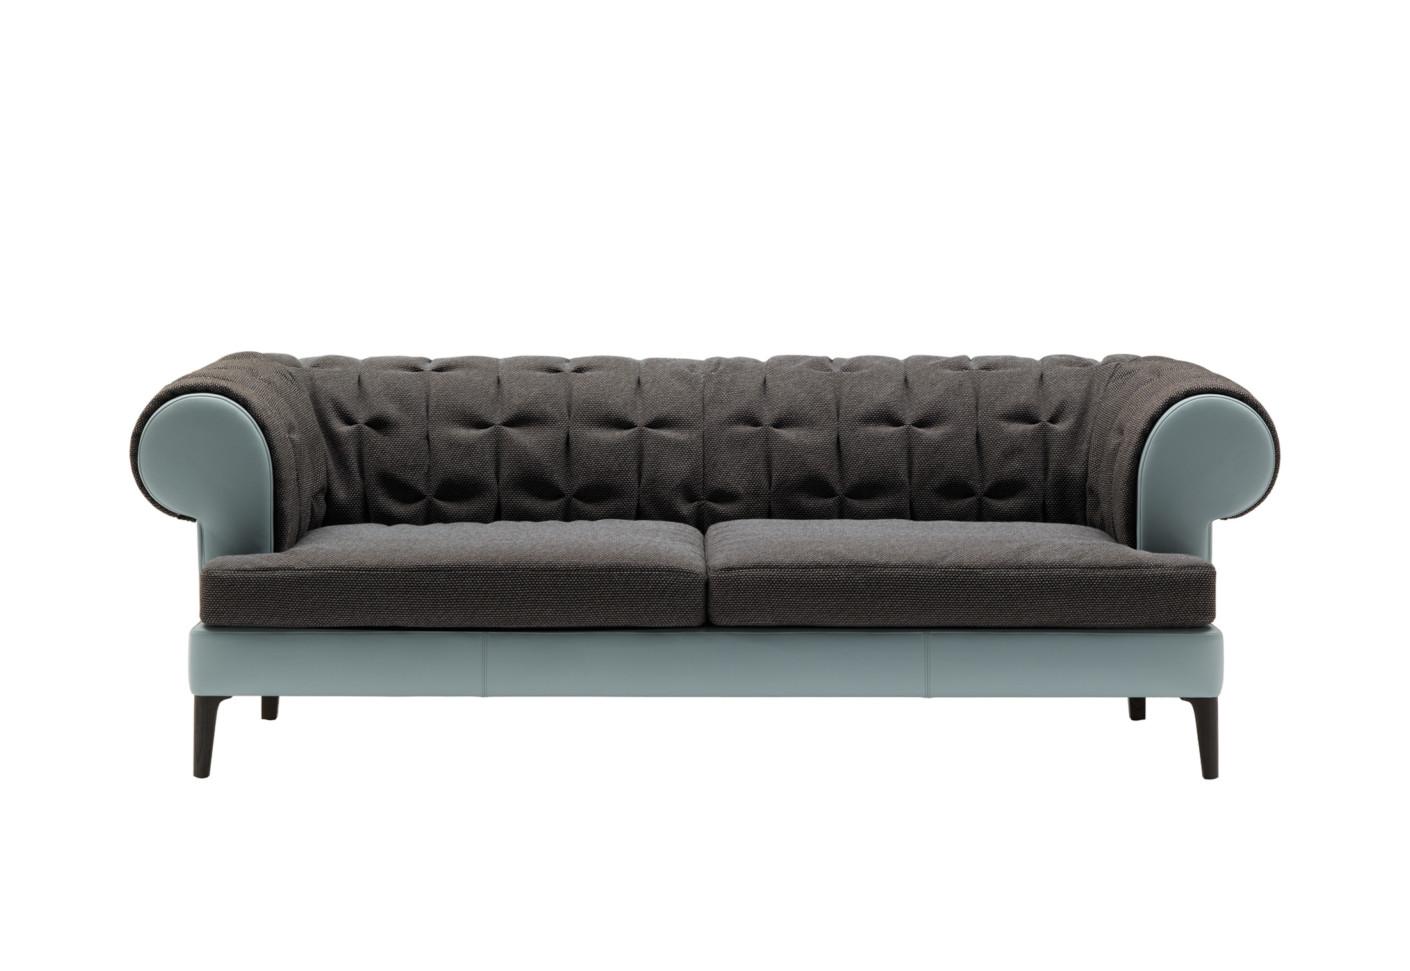 mant von poltrona frau stylepark. Black Bedroom Furniture Sets. Home Design Ideas